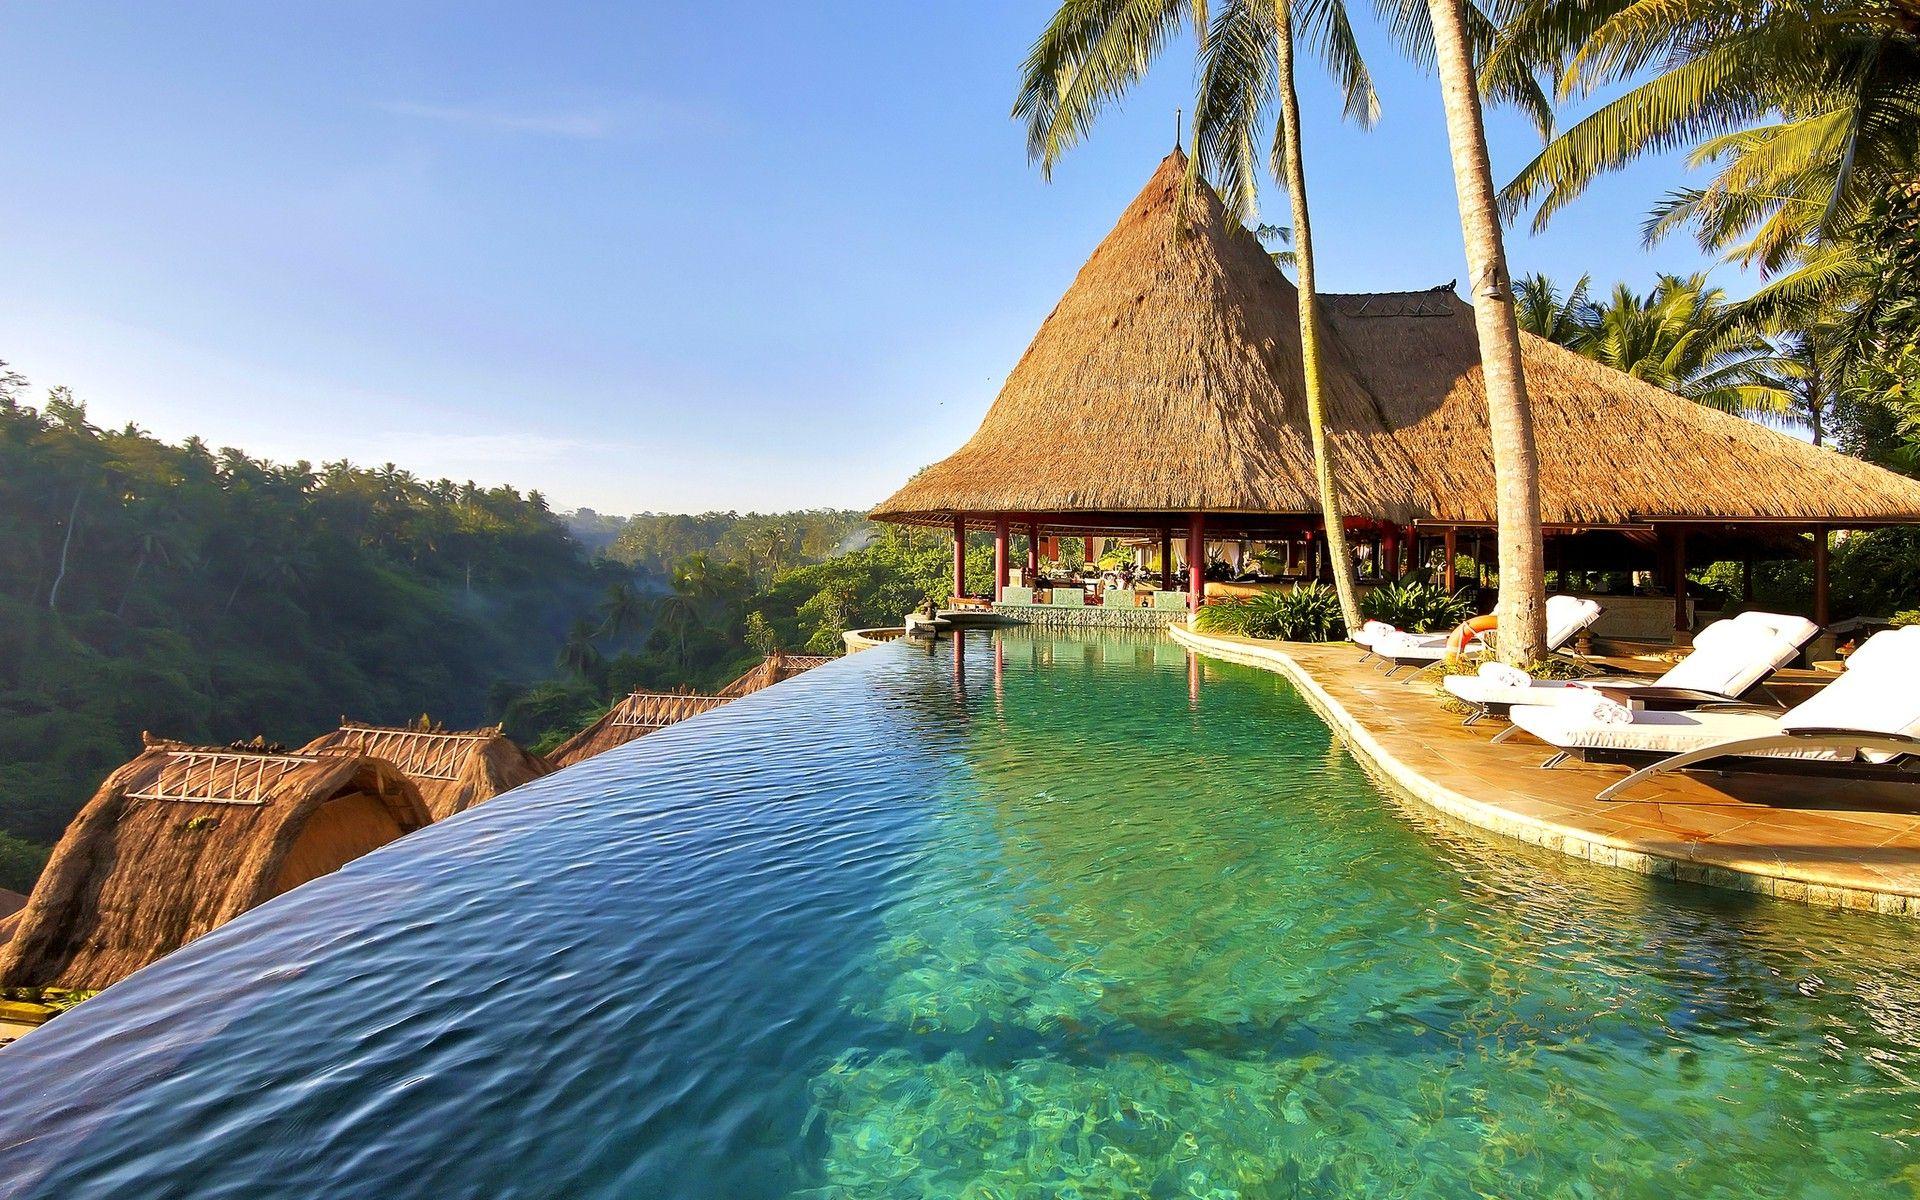 Manzara Resimleri Bali Resort Resort Spa Tree House Download swimming pool hd wallpapers to